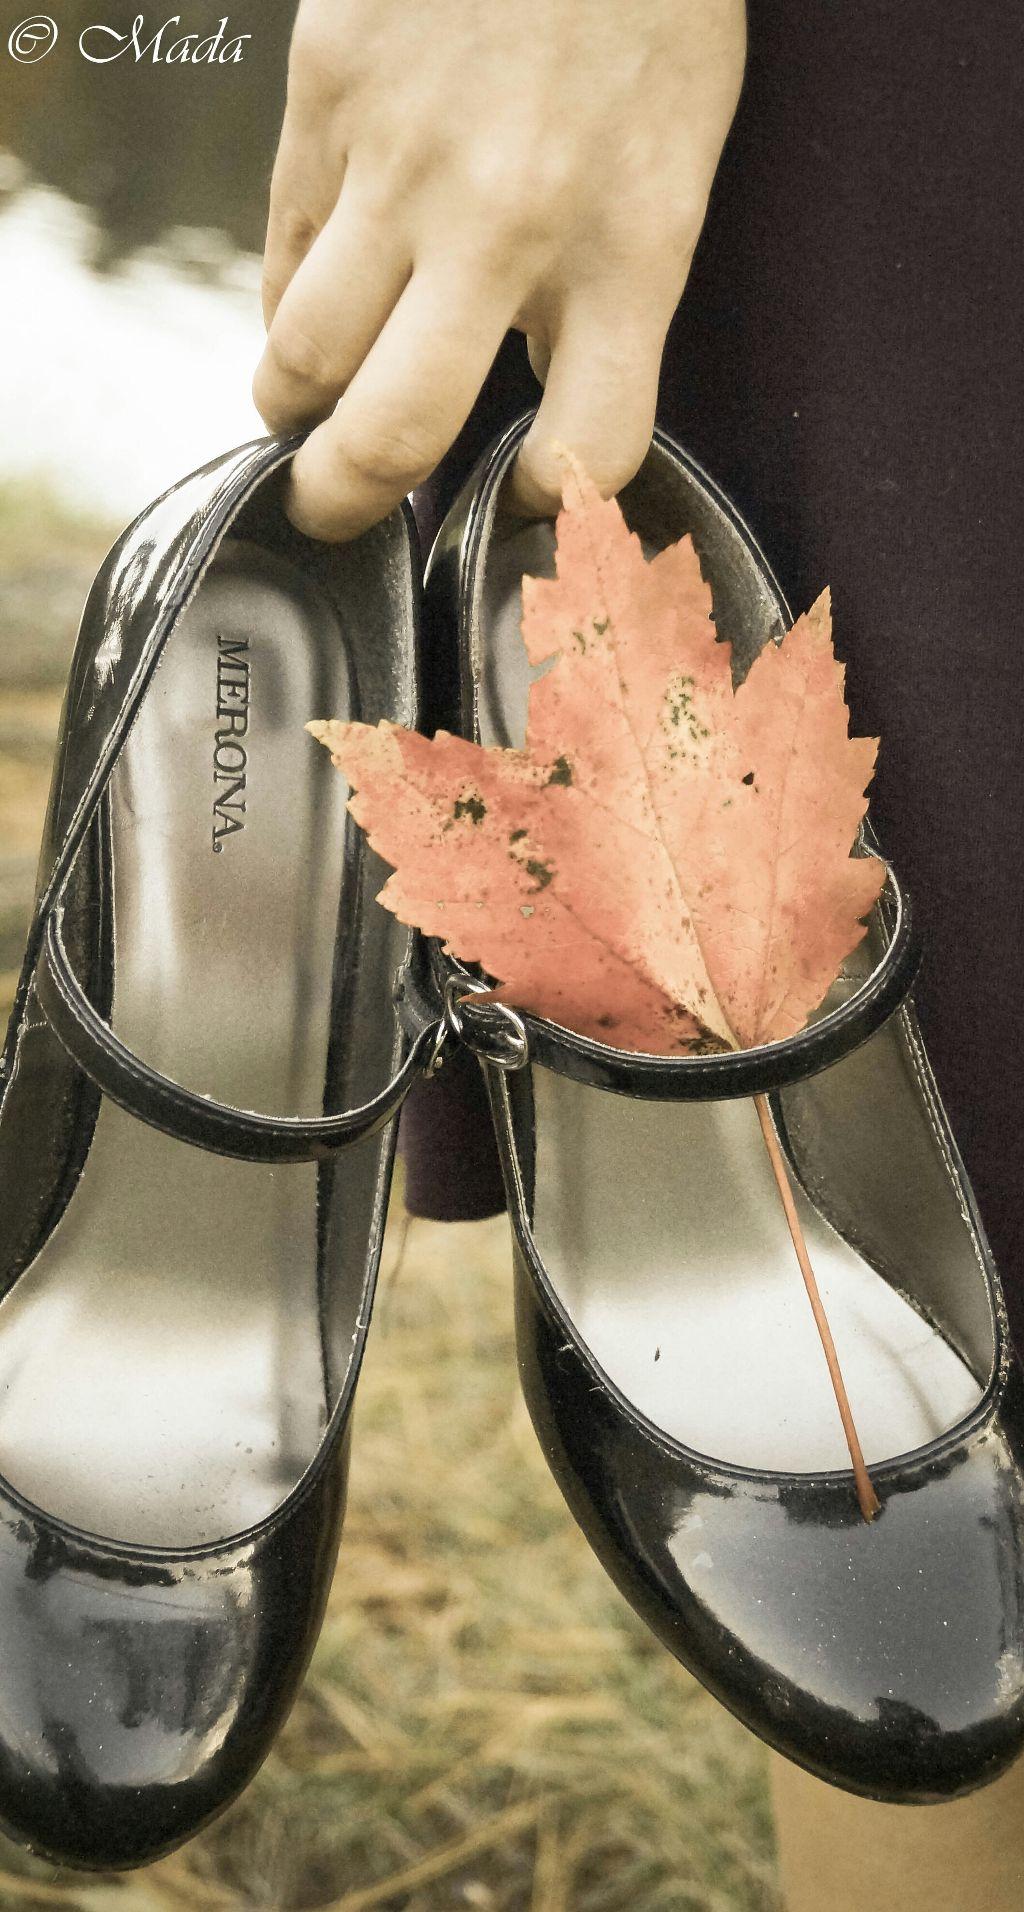 #creative  #cute   #colorful  #leaf #beautiful #nature #orange #shoes #hand #followme #photography  #photoshoot